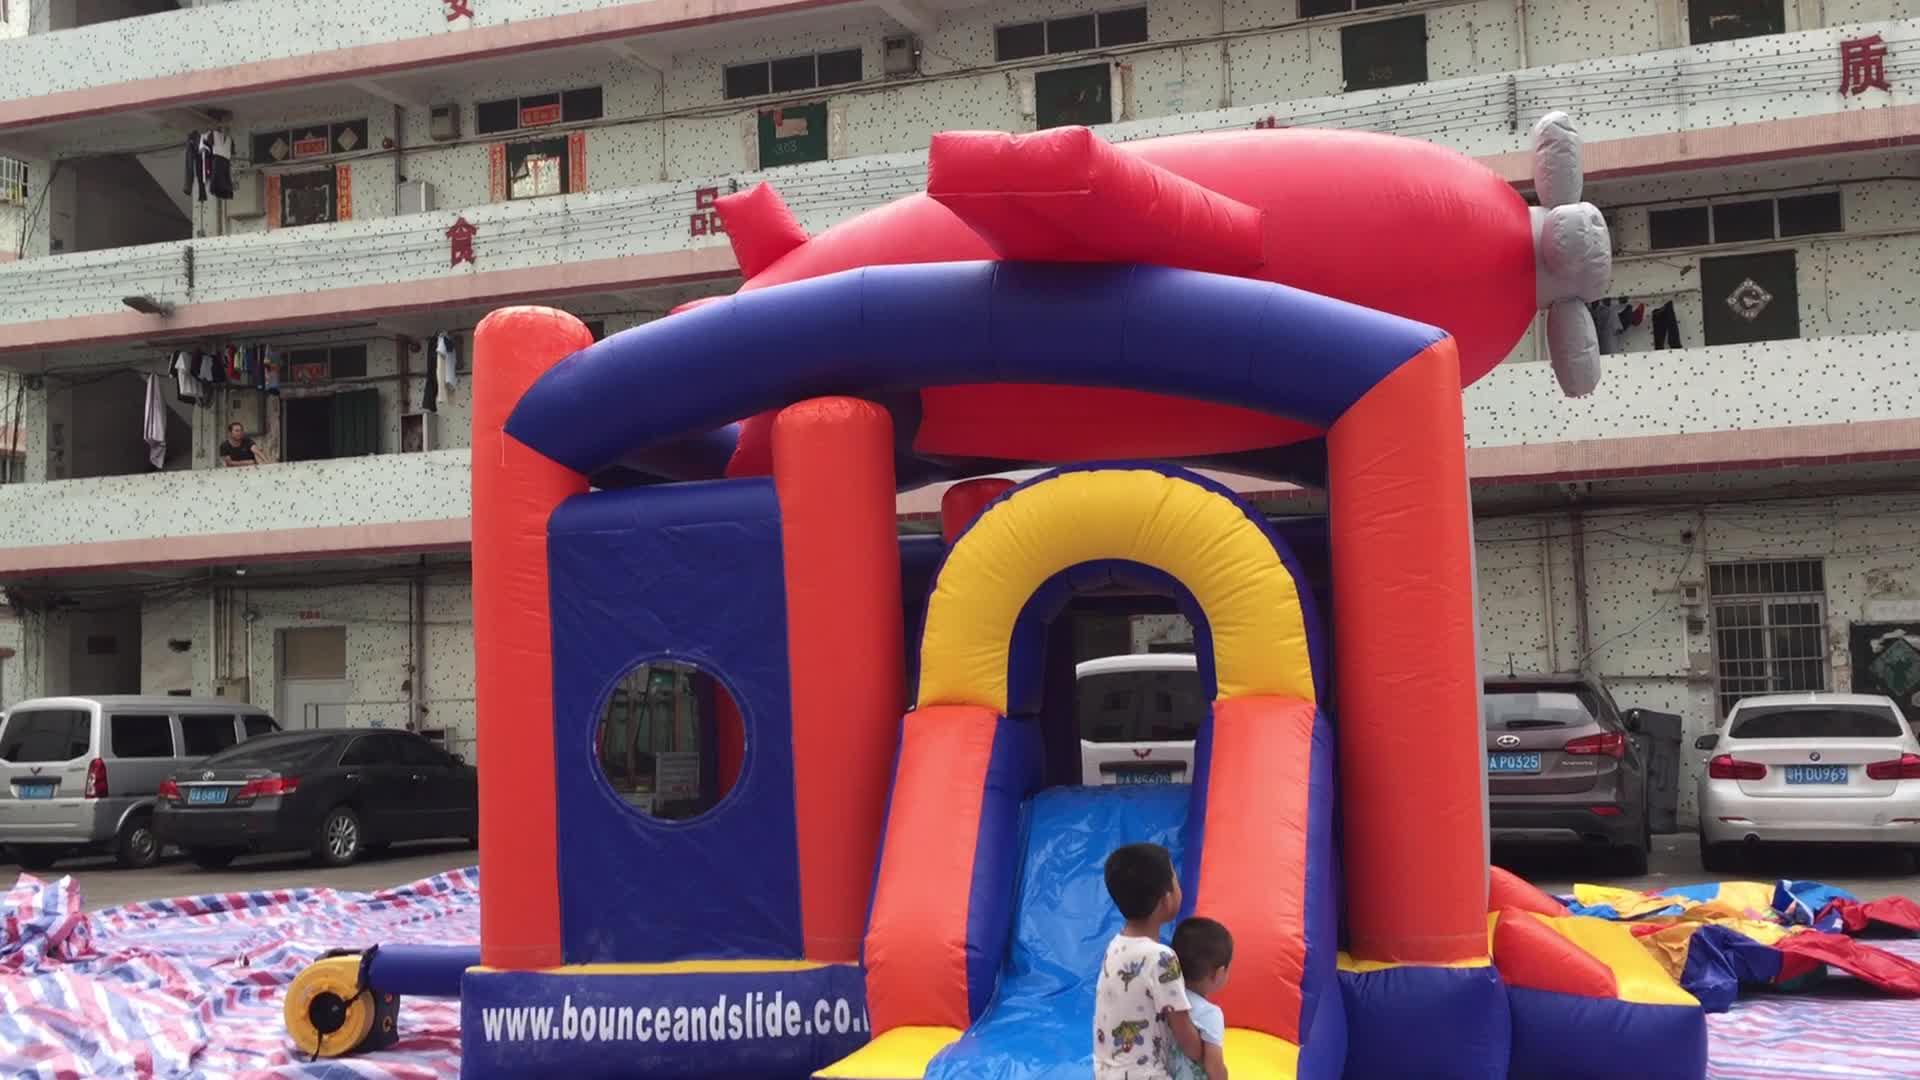 Inflatable bouncer plane /plane shape inflatable bouncer/customized plane bouncer house for sale